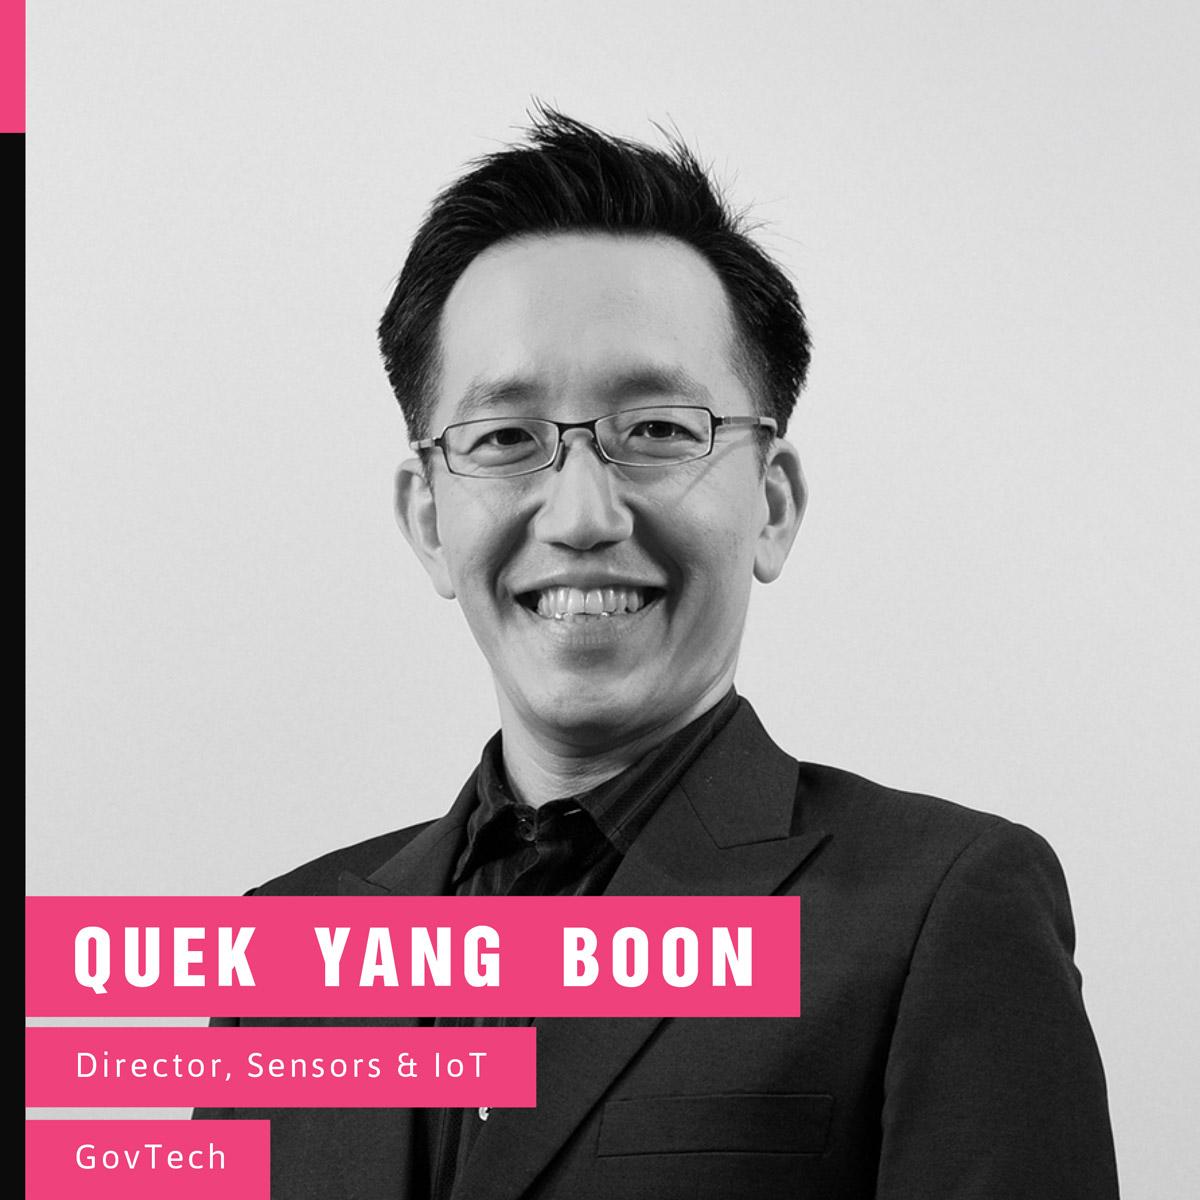 Mr Quek Yang Boon